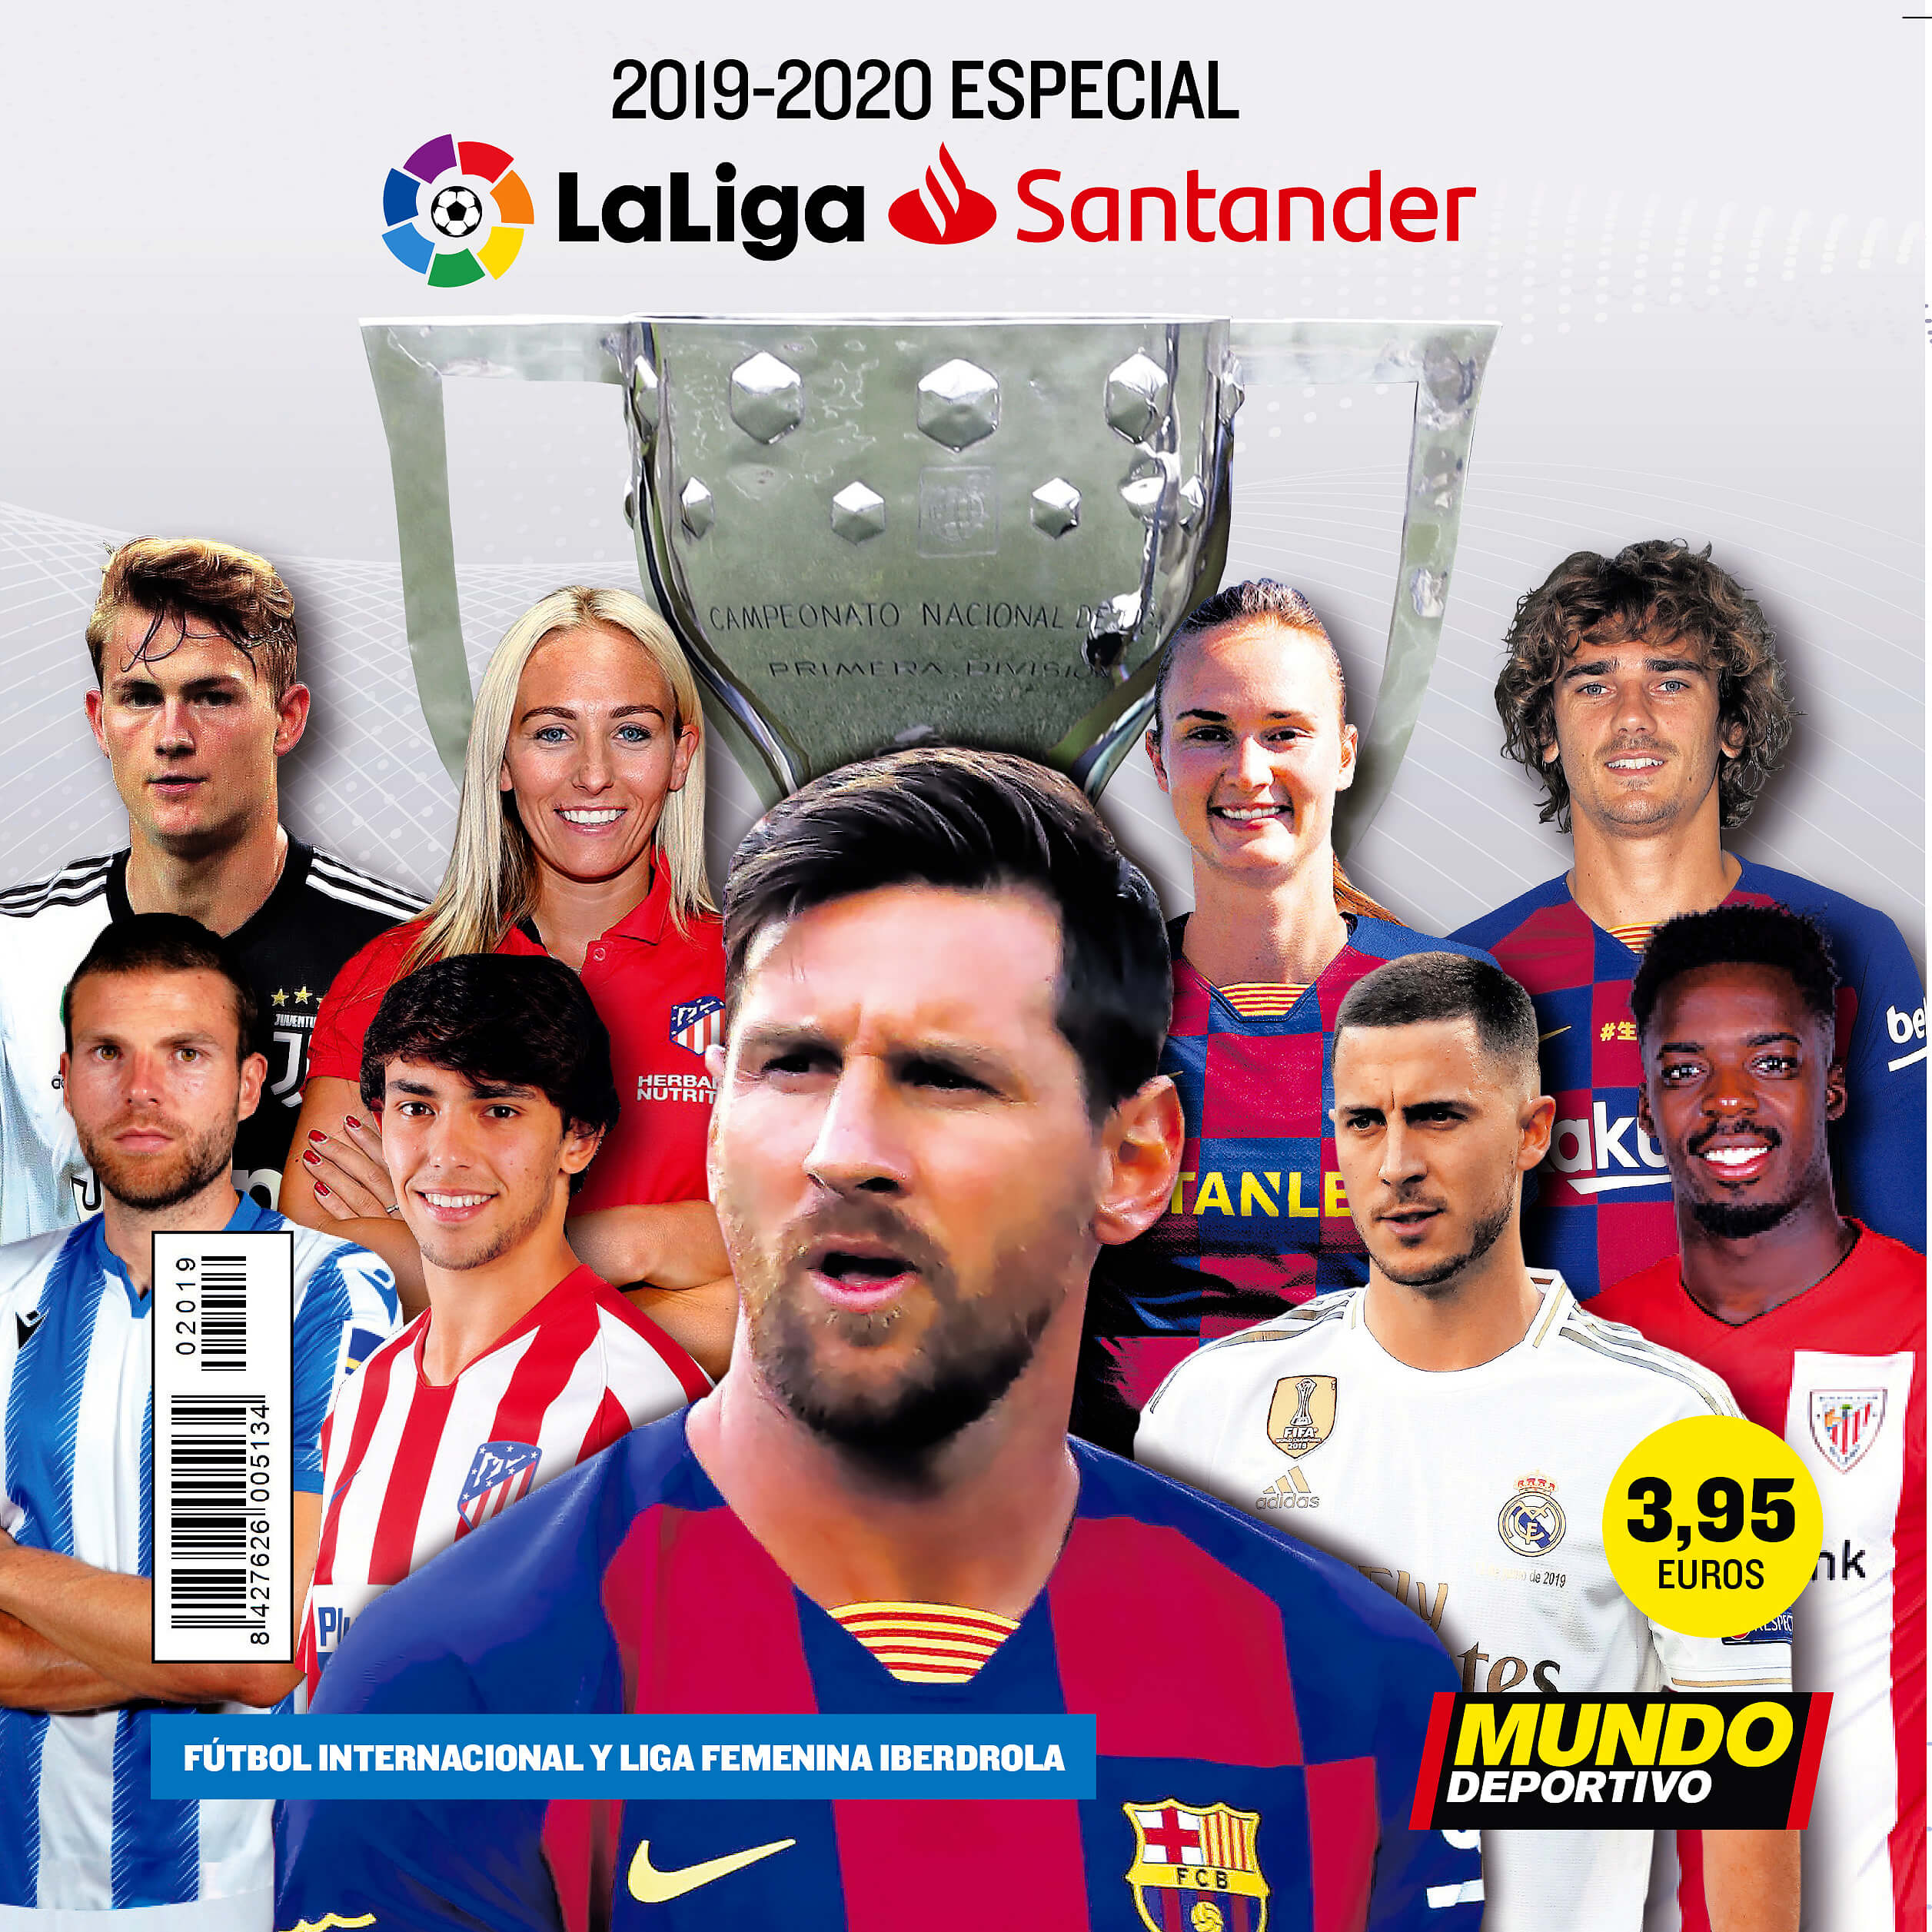 Portada Especial LaLiga 2019-20